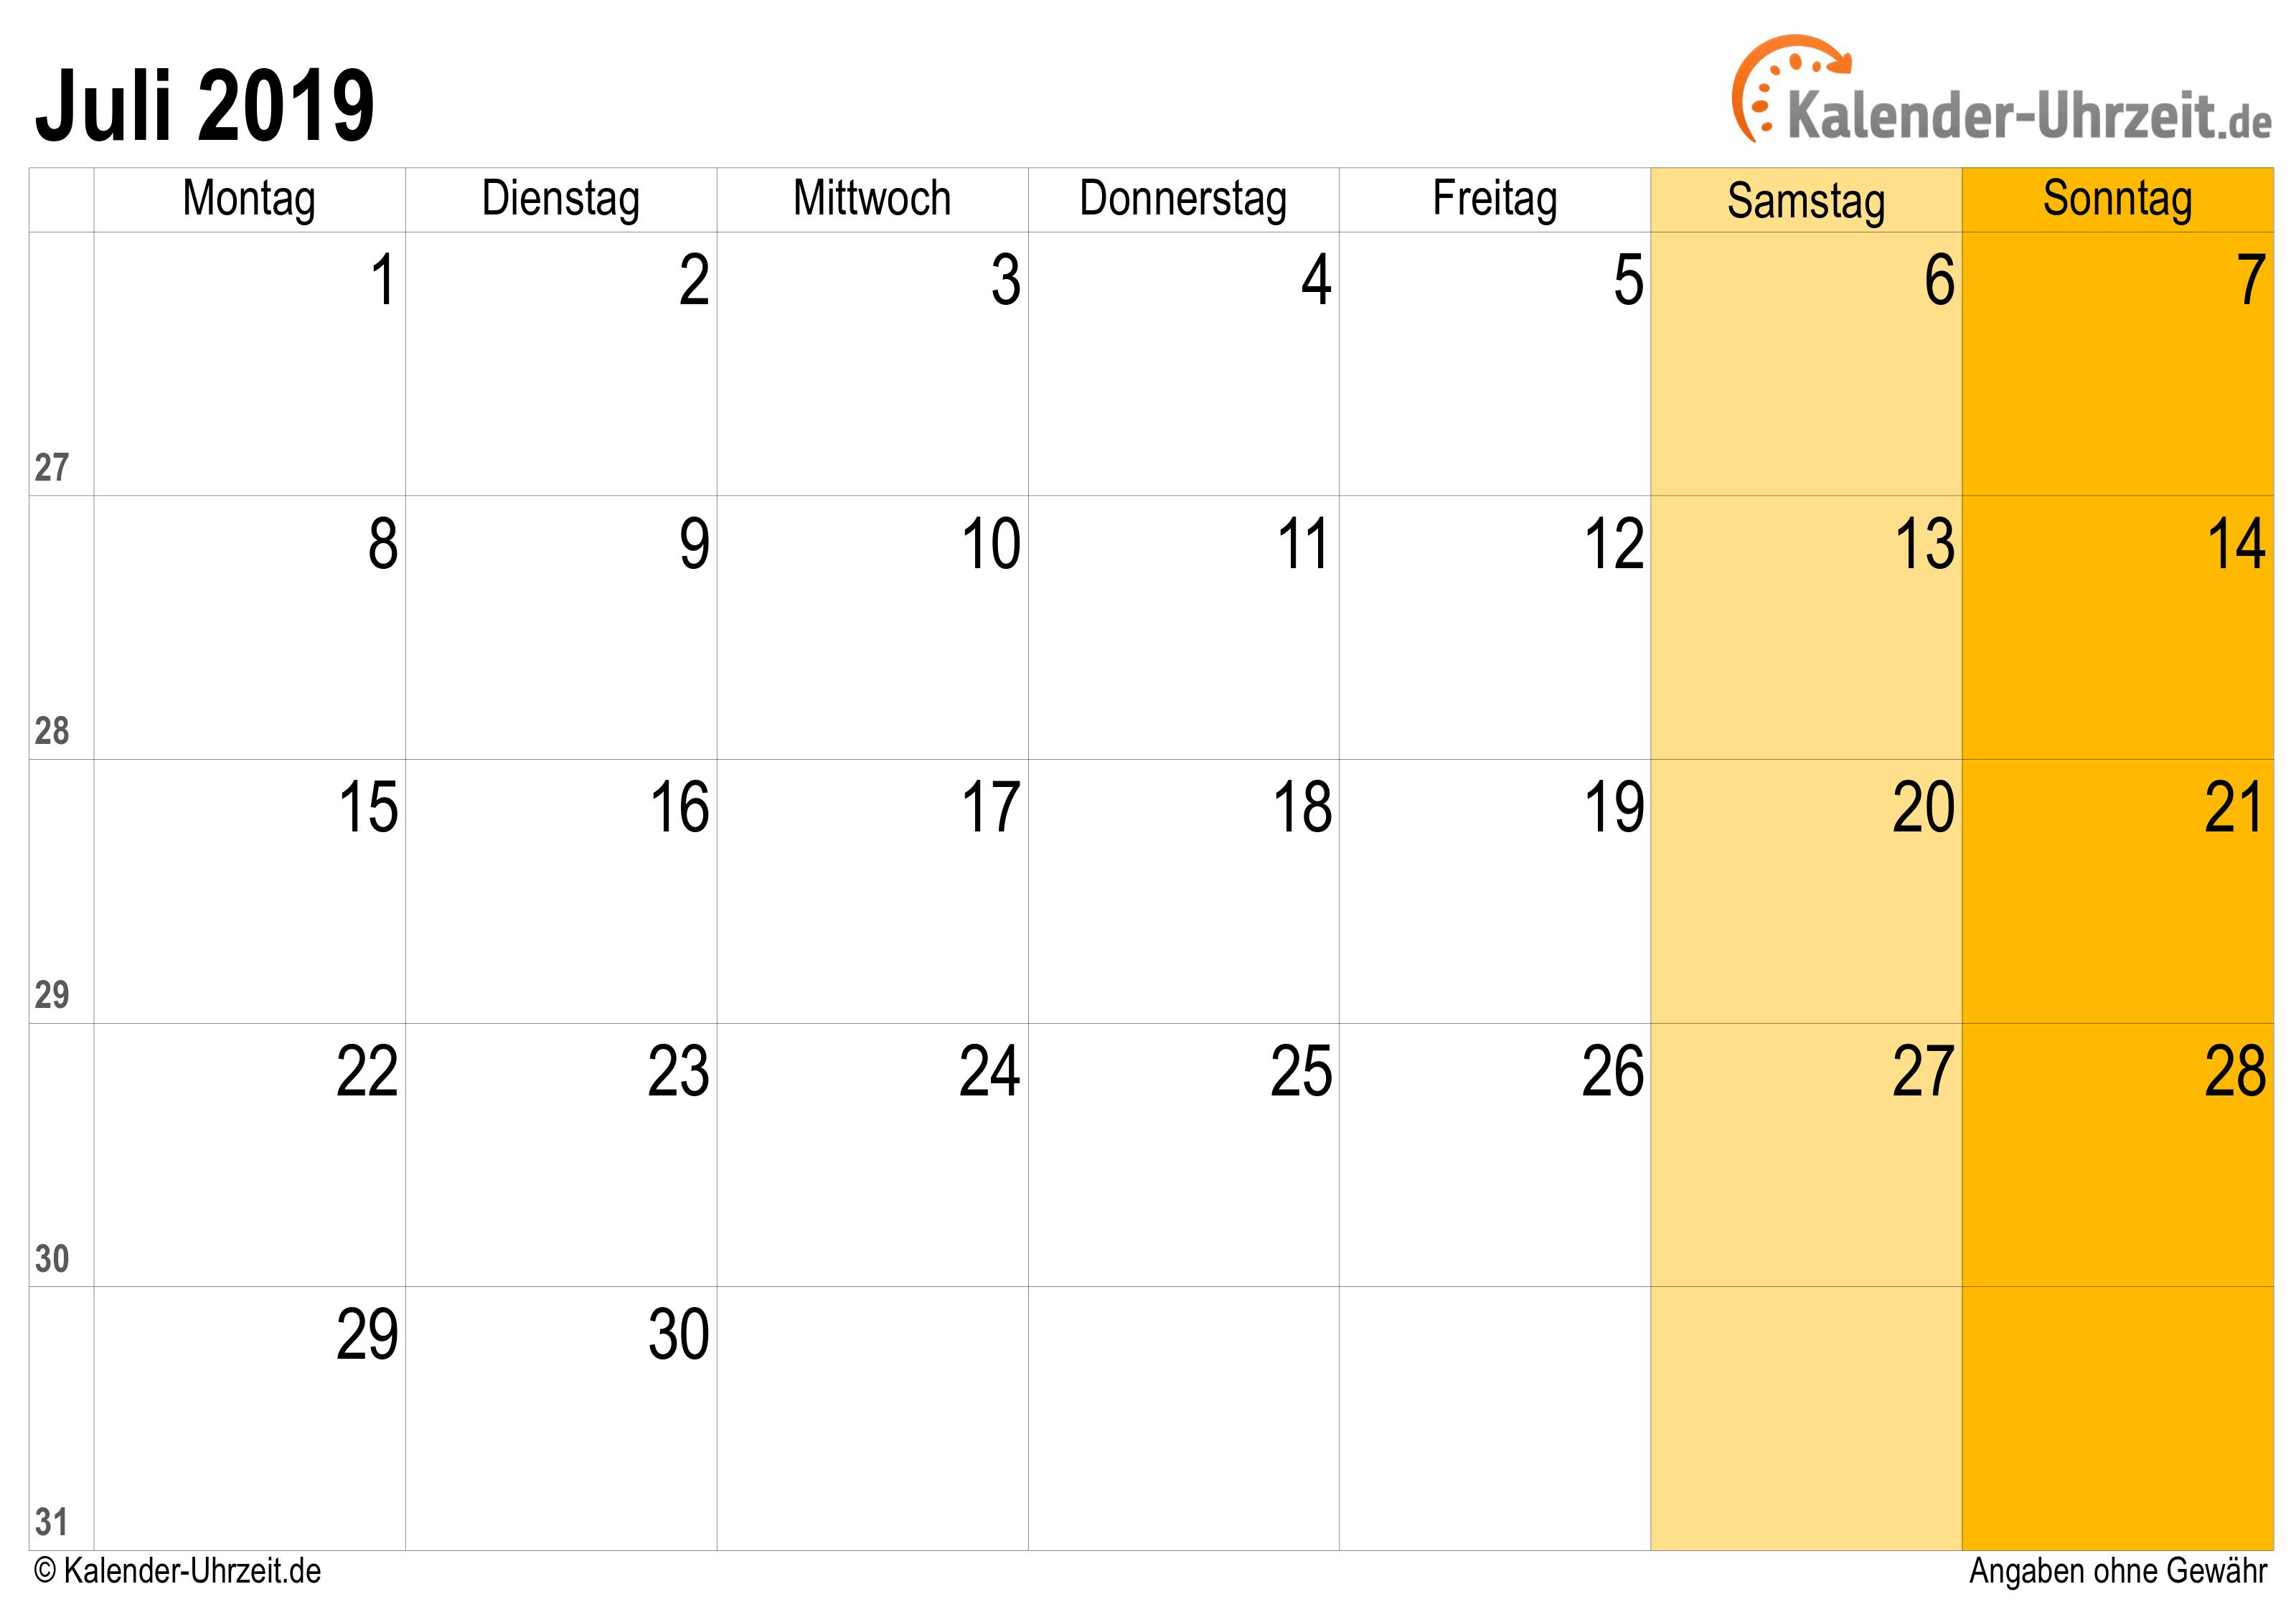 juli 2019 kalender mit feiertagen. Black Bedroom Furniture Sets. Home Design Ideas